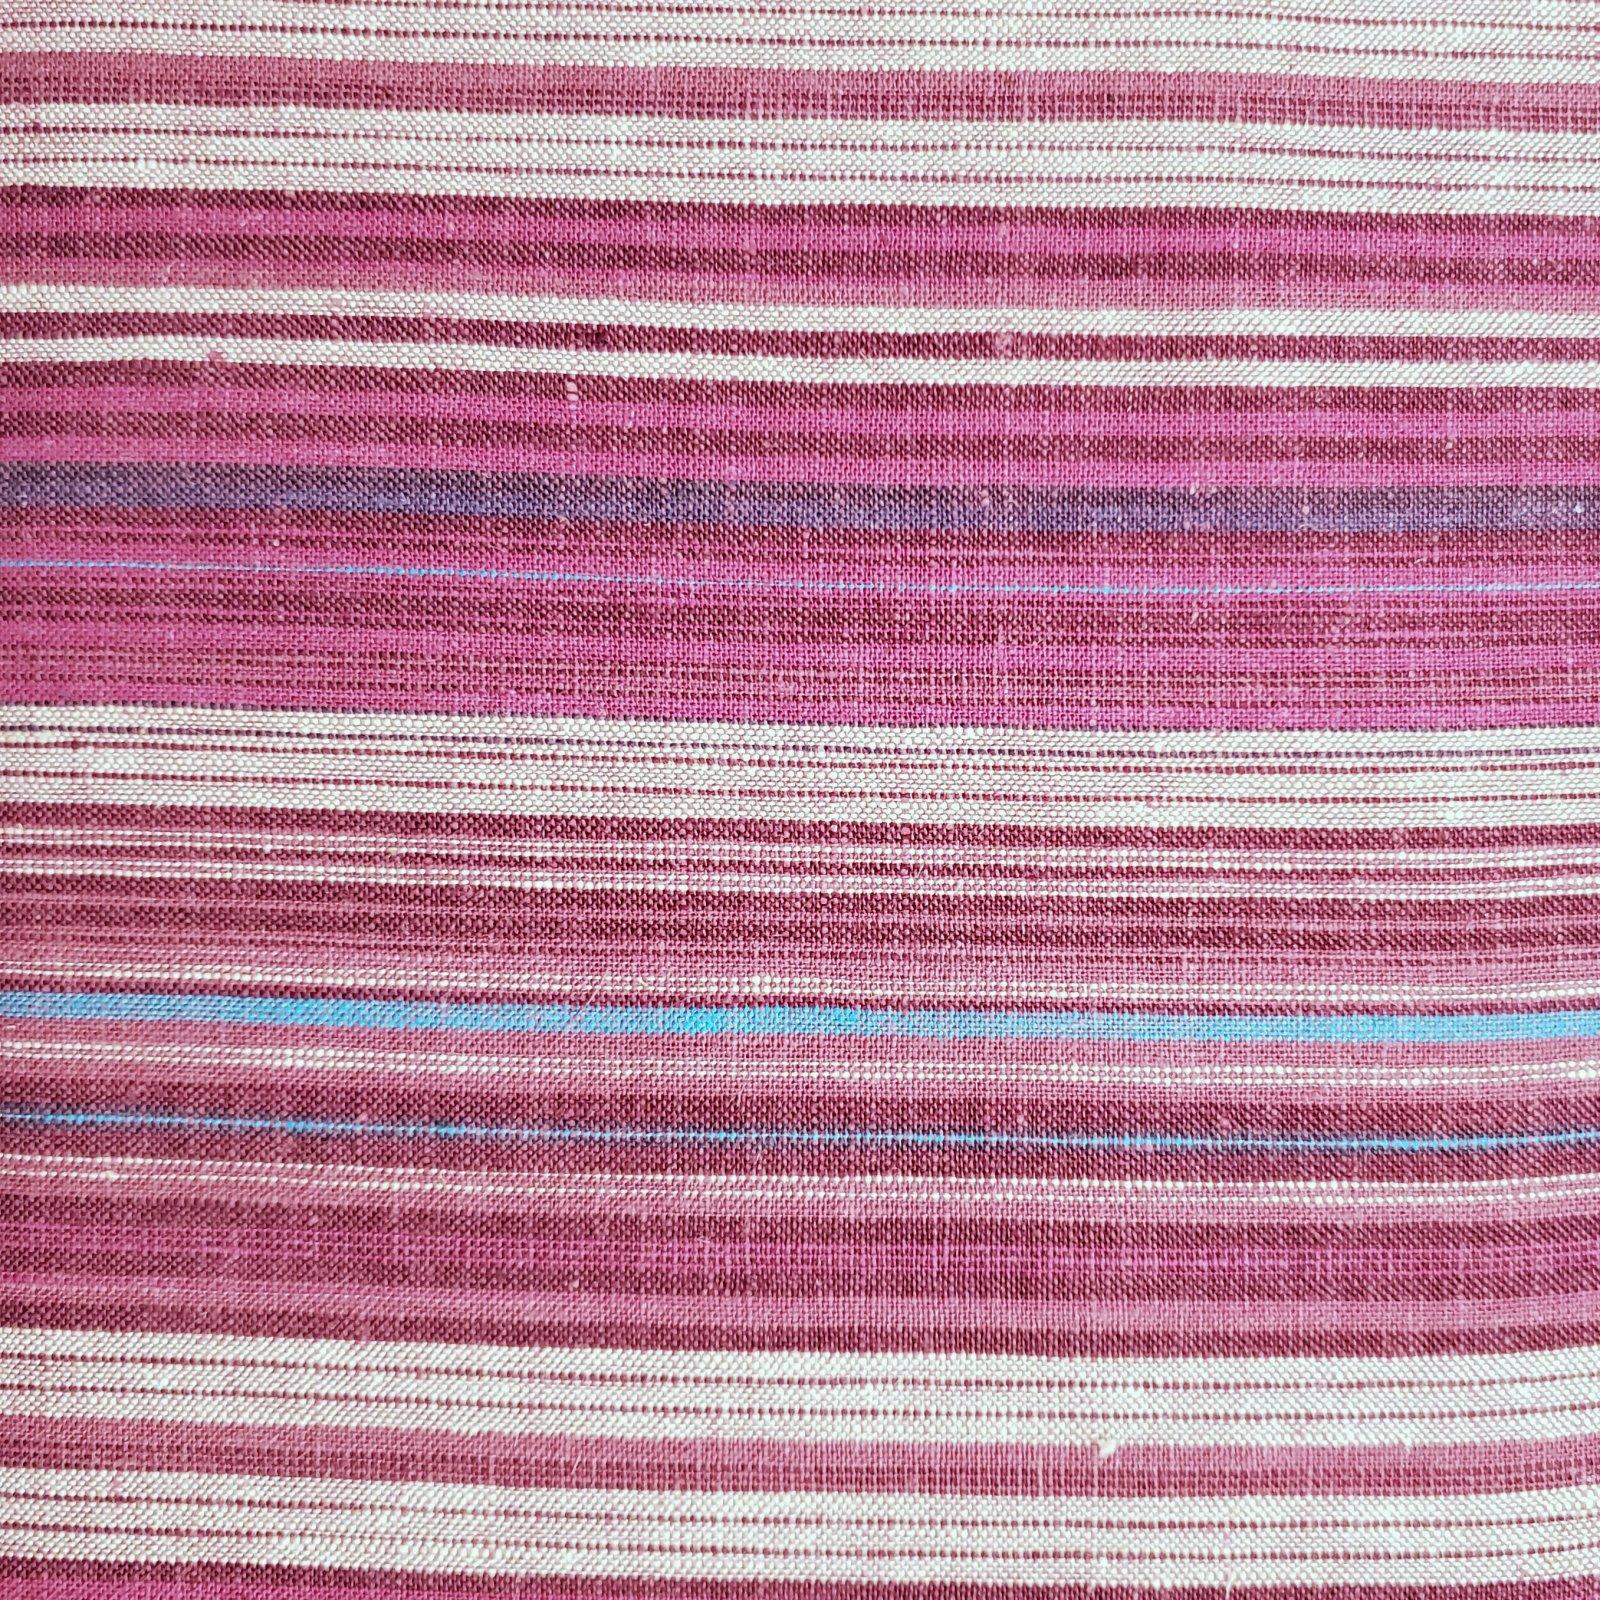 Fabric Imported European 100% Linen - Magenta Sunset Stripe REMNANT 2.5 Yards